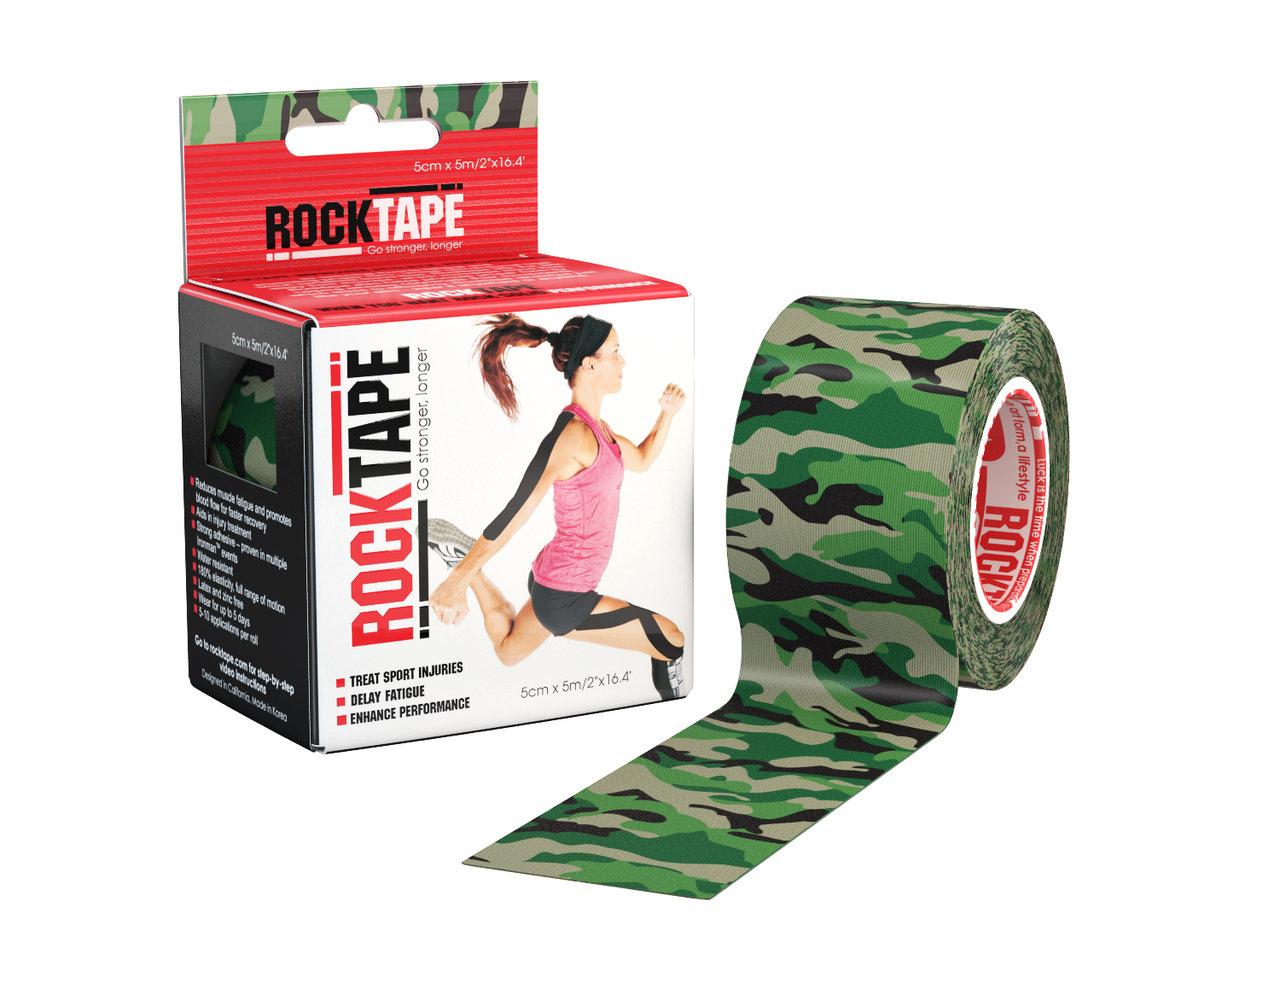 RockTape, 5см×5м, Green Camouflage